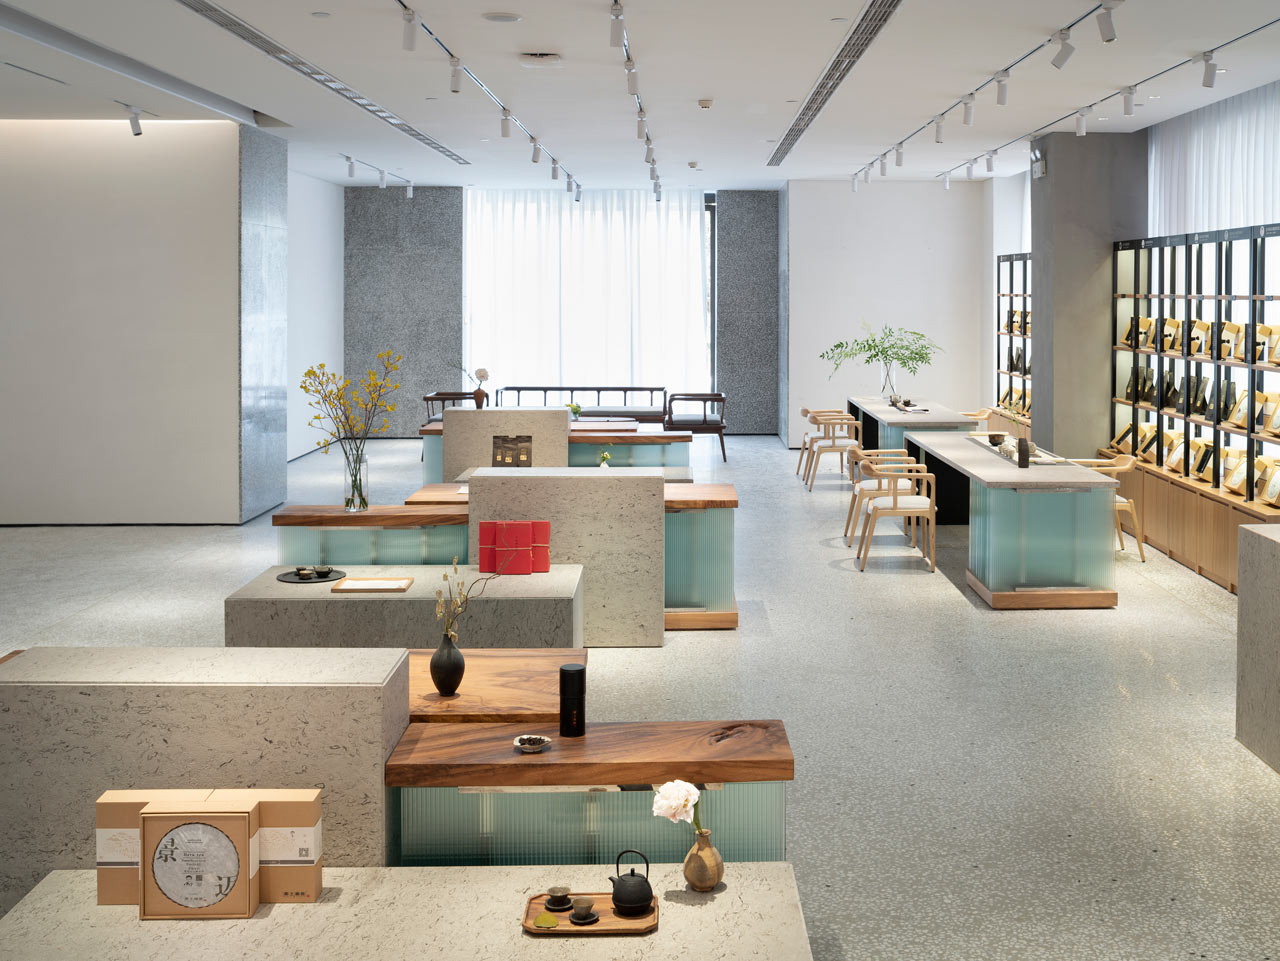 TEA MASTER: A Modern Teahouse in Hangzhou, China